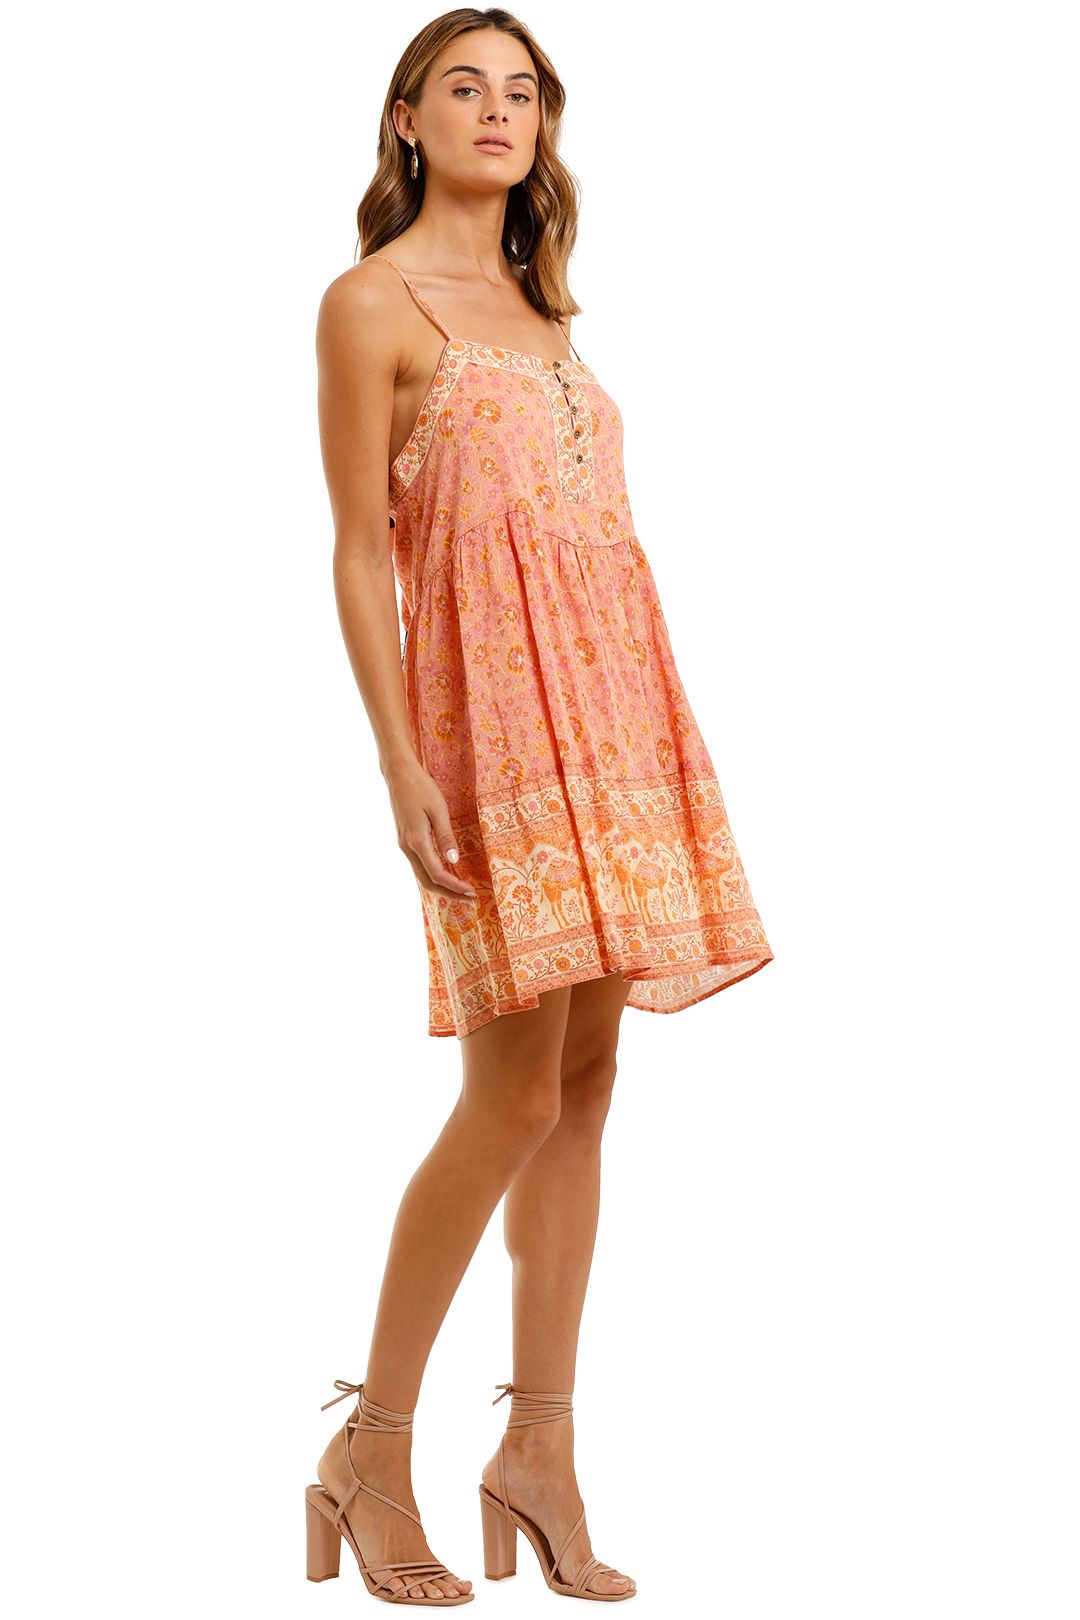 Spell Sundown Strappy Mini Dress Apricot